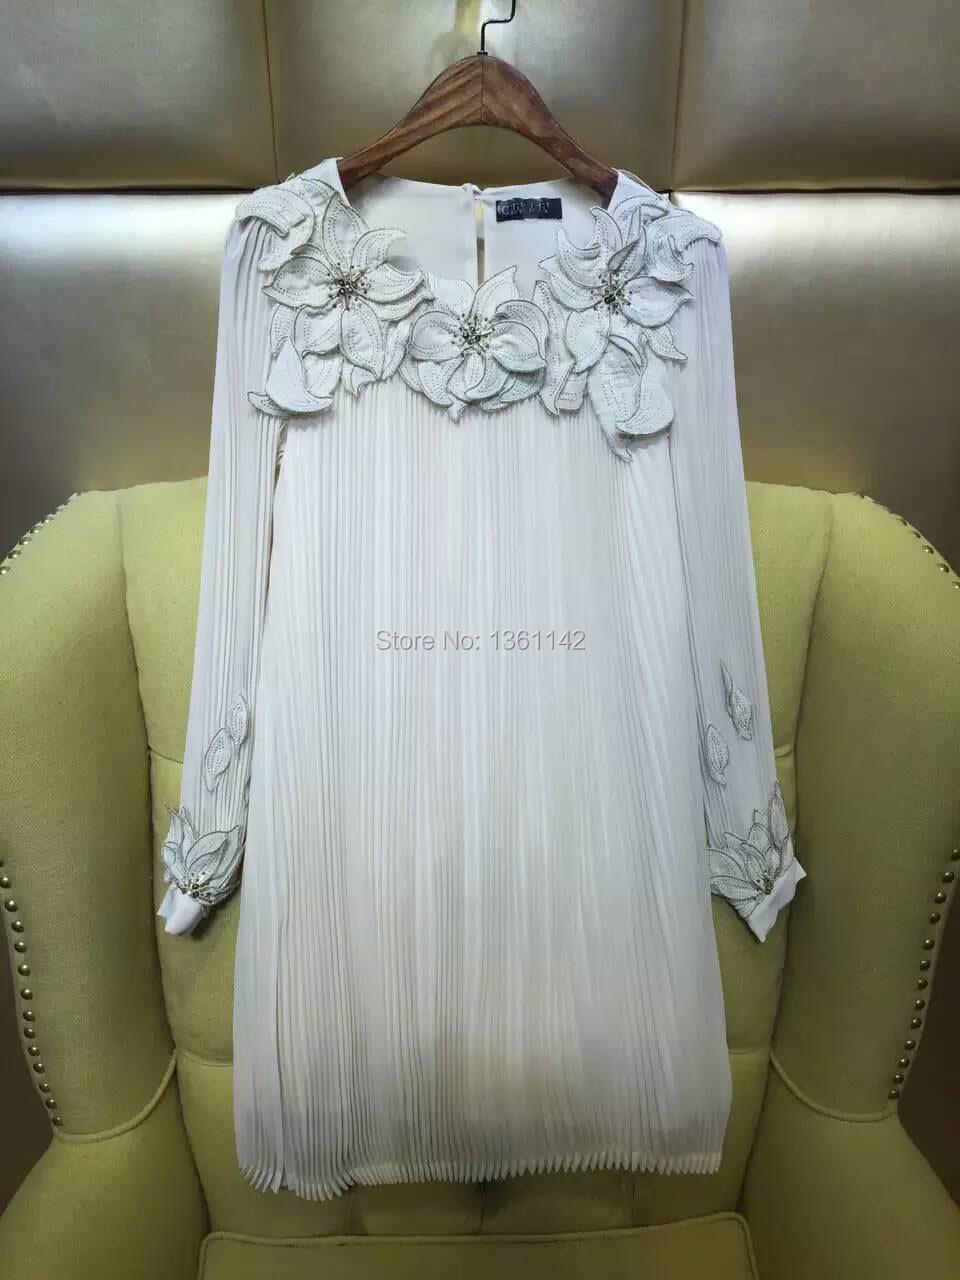 Luxury Brand Runway Dress 2016 New Fashion Dress Women Free ShippingОдежда и ак�е��уары<br><br><br>Aliexpress